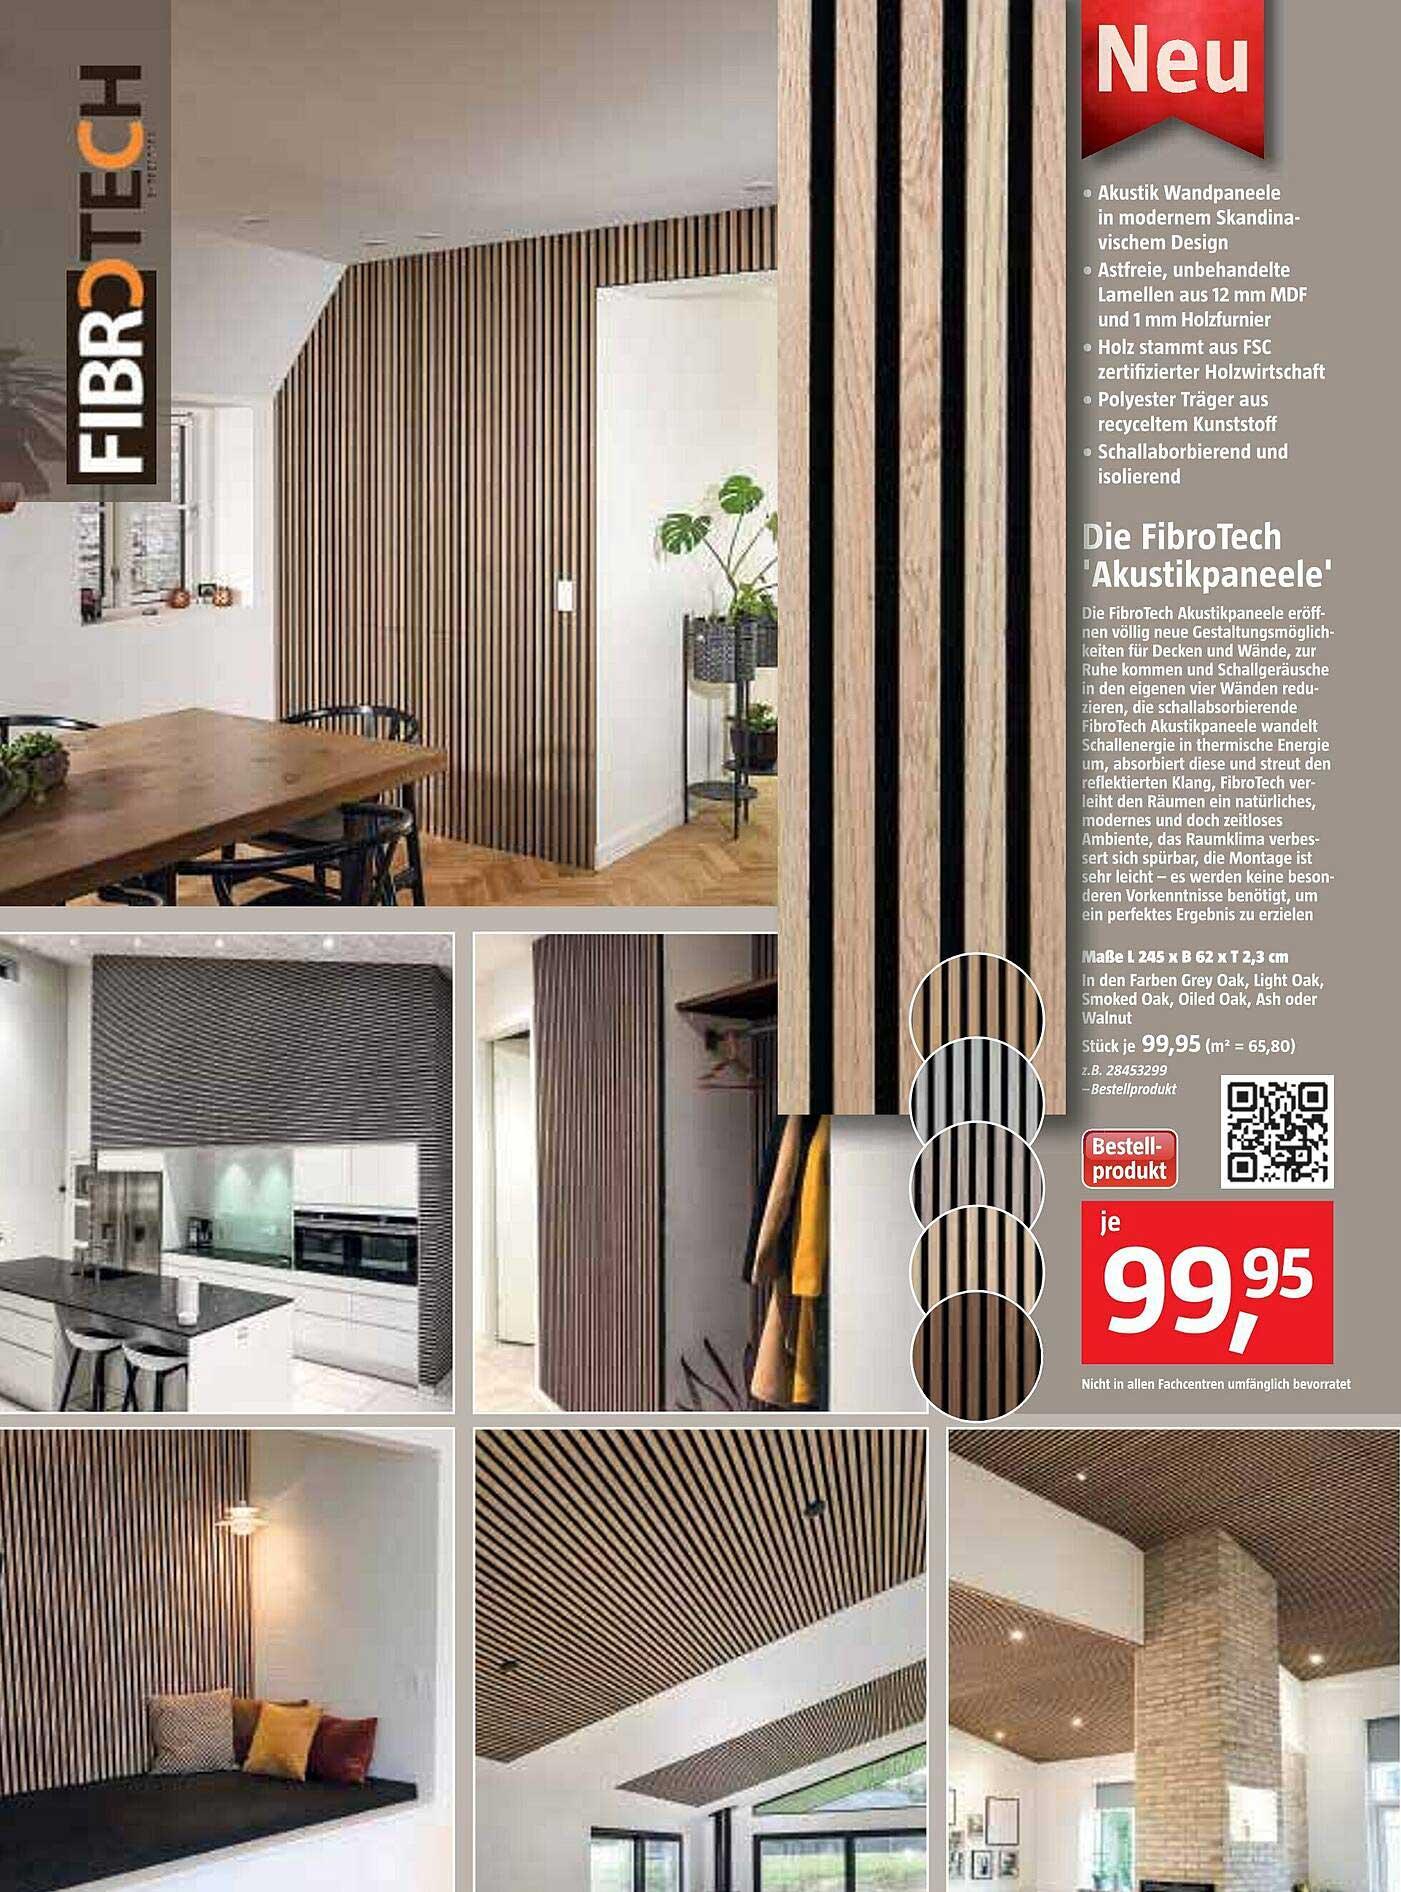 Bauhaus Die Fibrotech 'akustikpaneele'